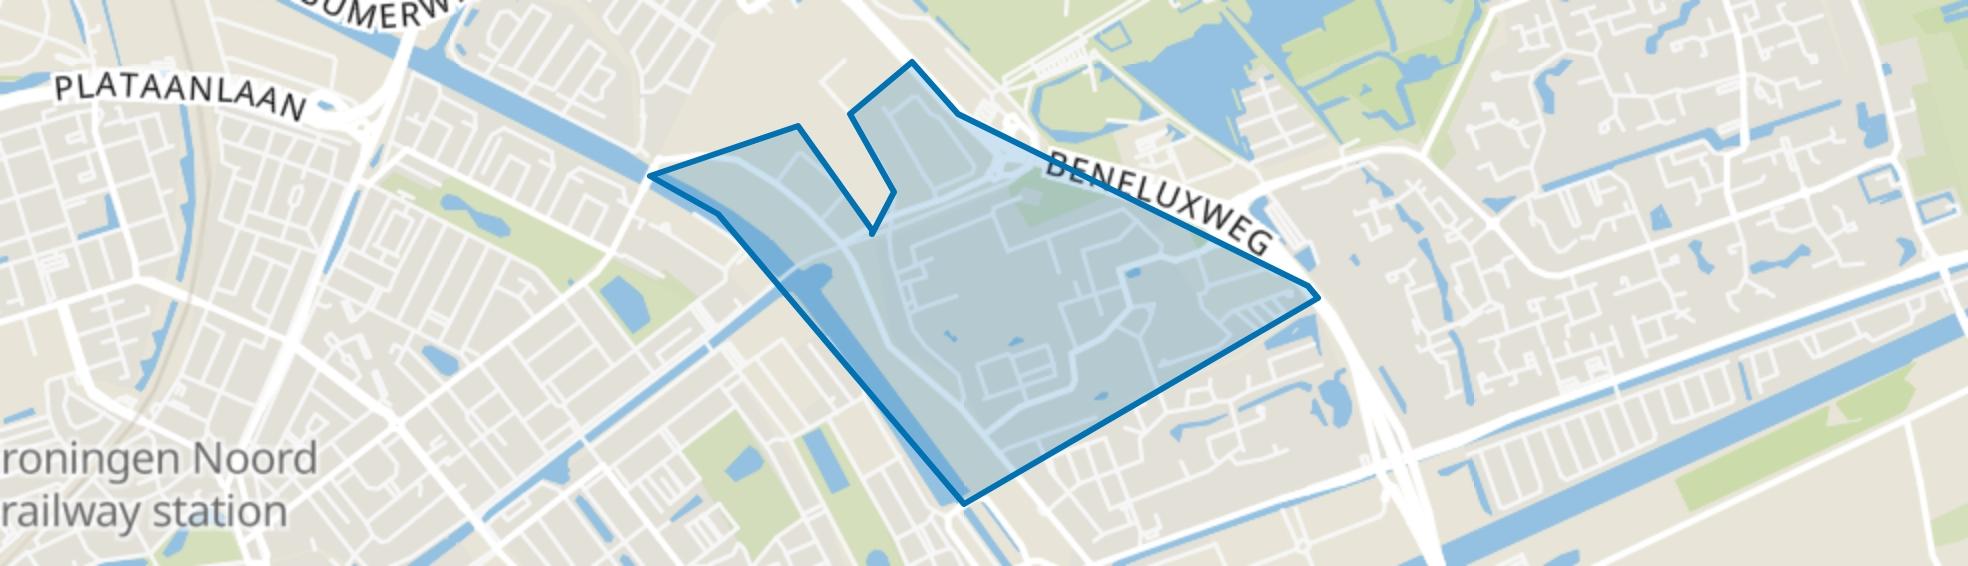 Ulgersmaborg, Groningen map